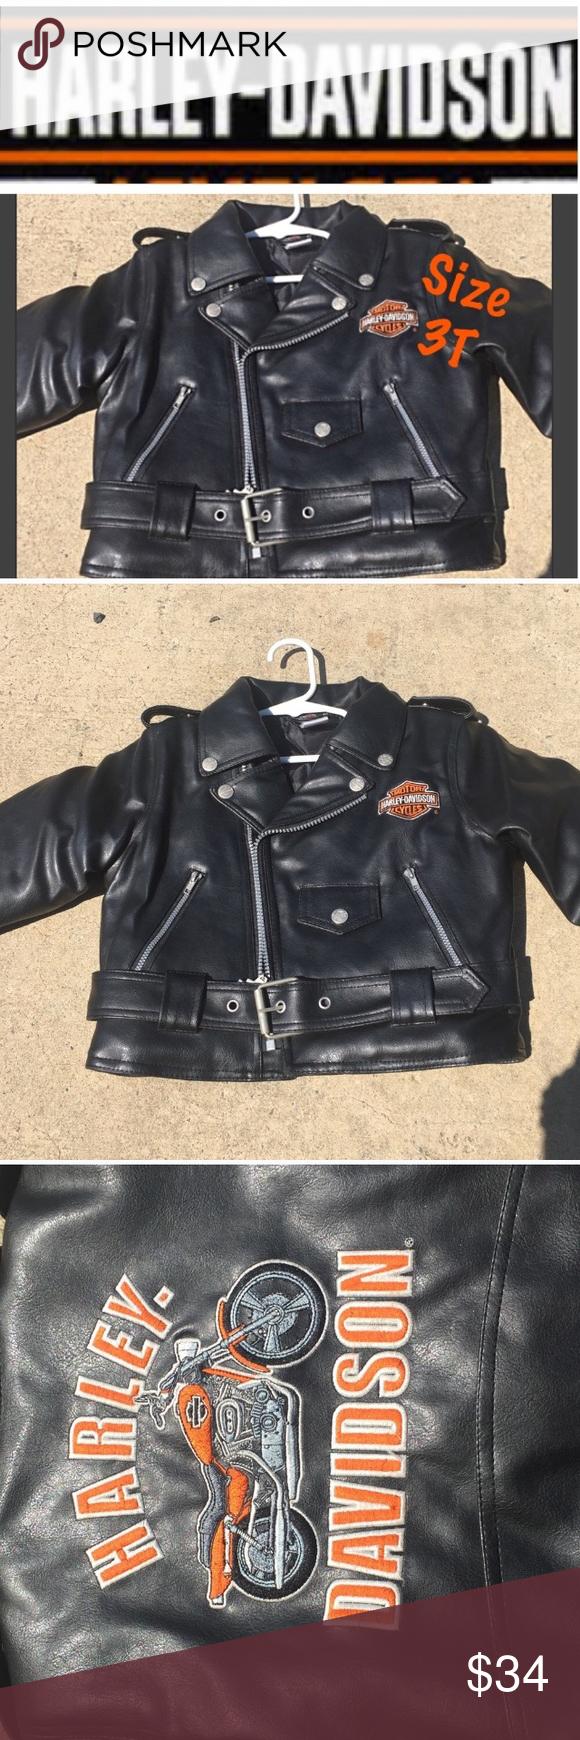 Toddler Harley Davidson Leather Jacket 3t Toddlers Harley Davidson Leather Jacket Size 3t Harley Davidson Leather Jackets Harley Davidson Jacket Leather Jacket [ 1740 x 580 Pixel ]